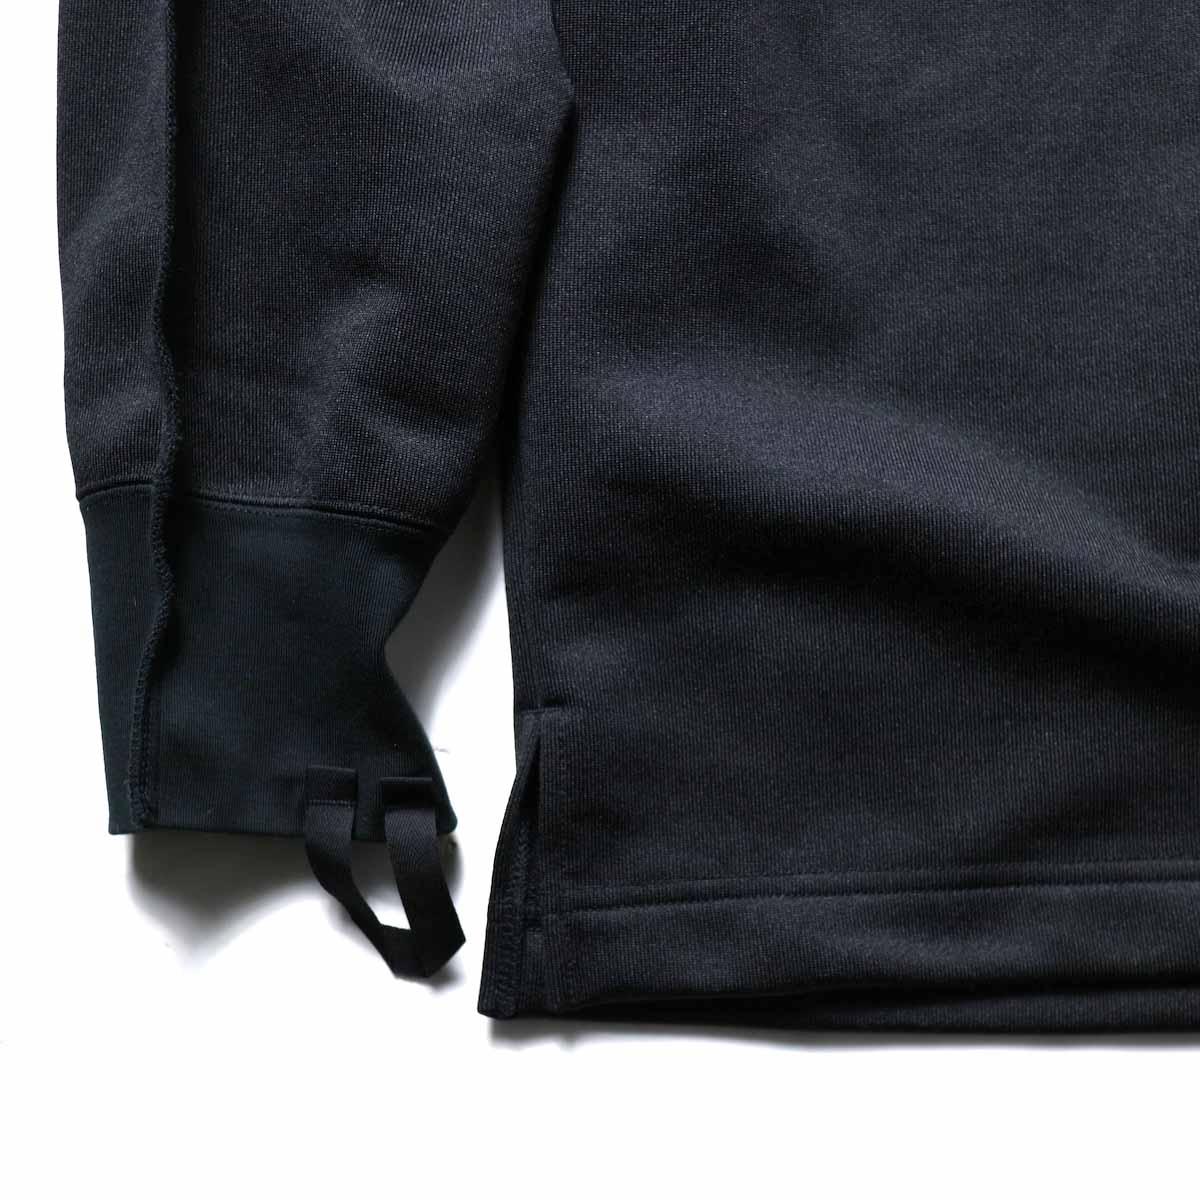 N.HOOLYWOOD / 9211-CS08-024pieces L/S Jersey (Black)袖、裾